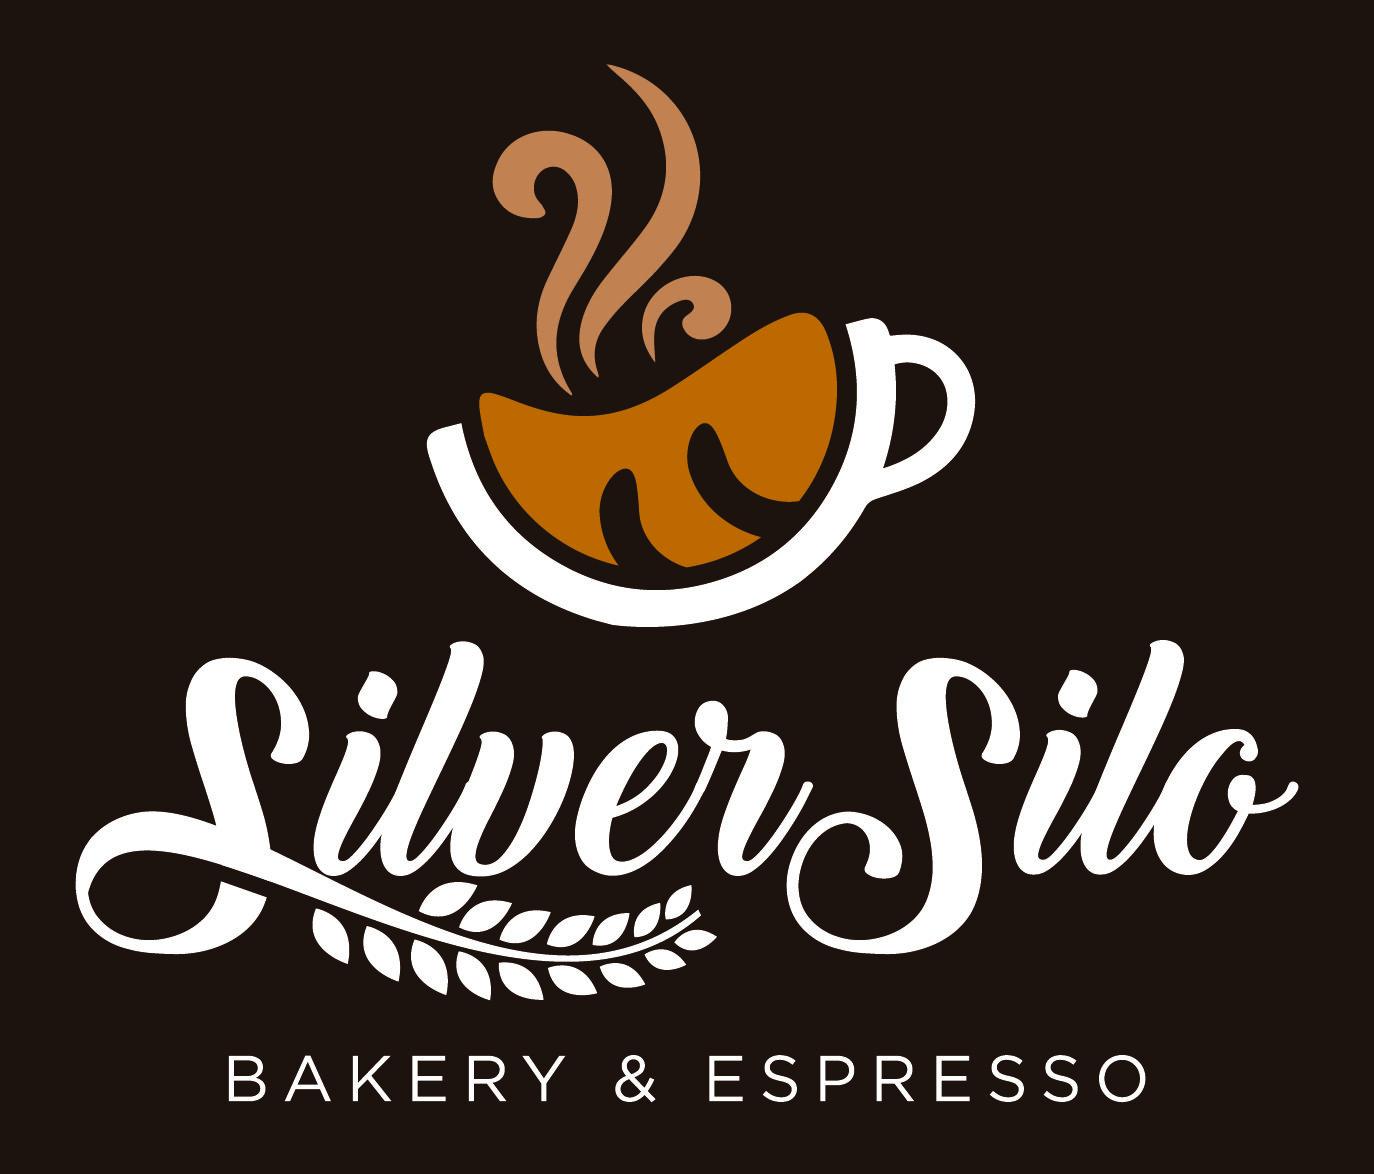 Silver Silo Bakery & Espresso logo